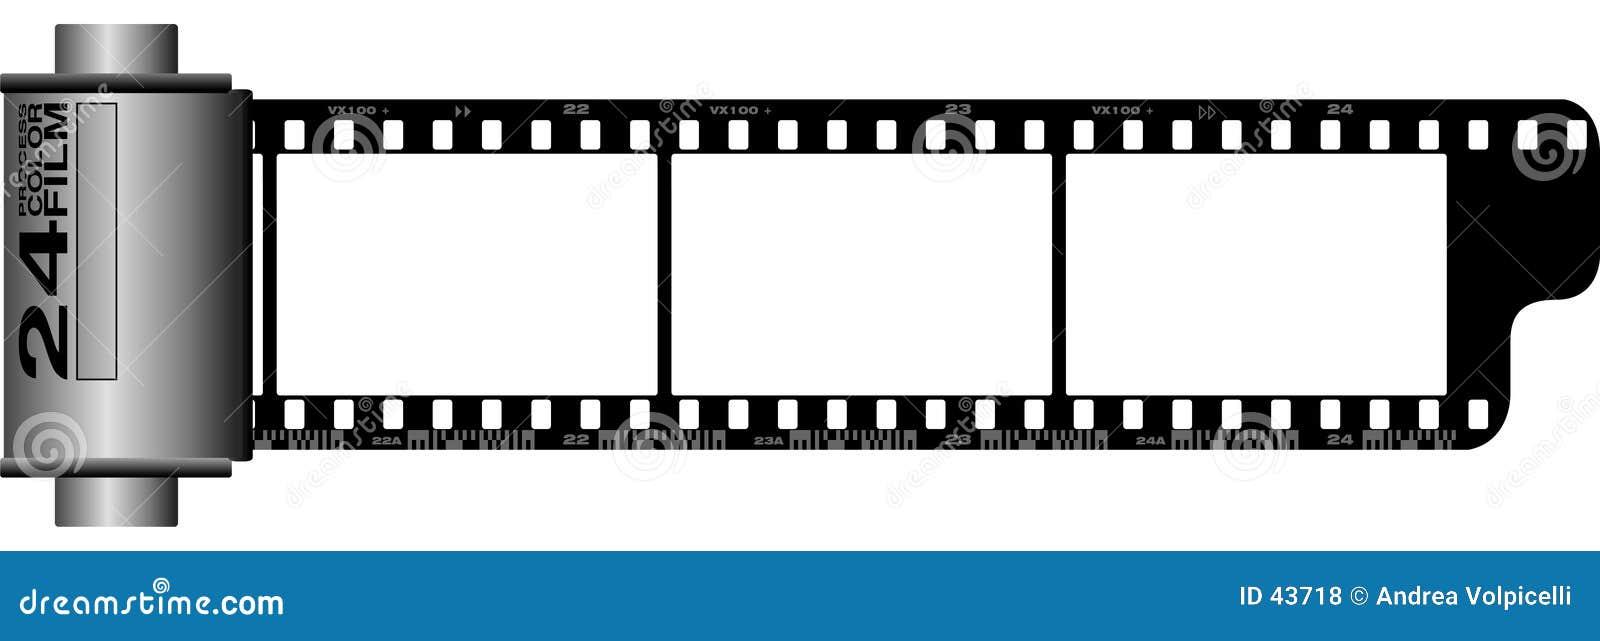 35 filmmillimetrar rulle